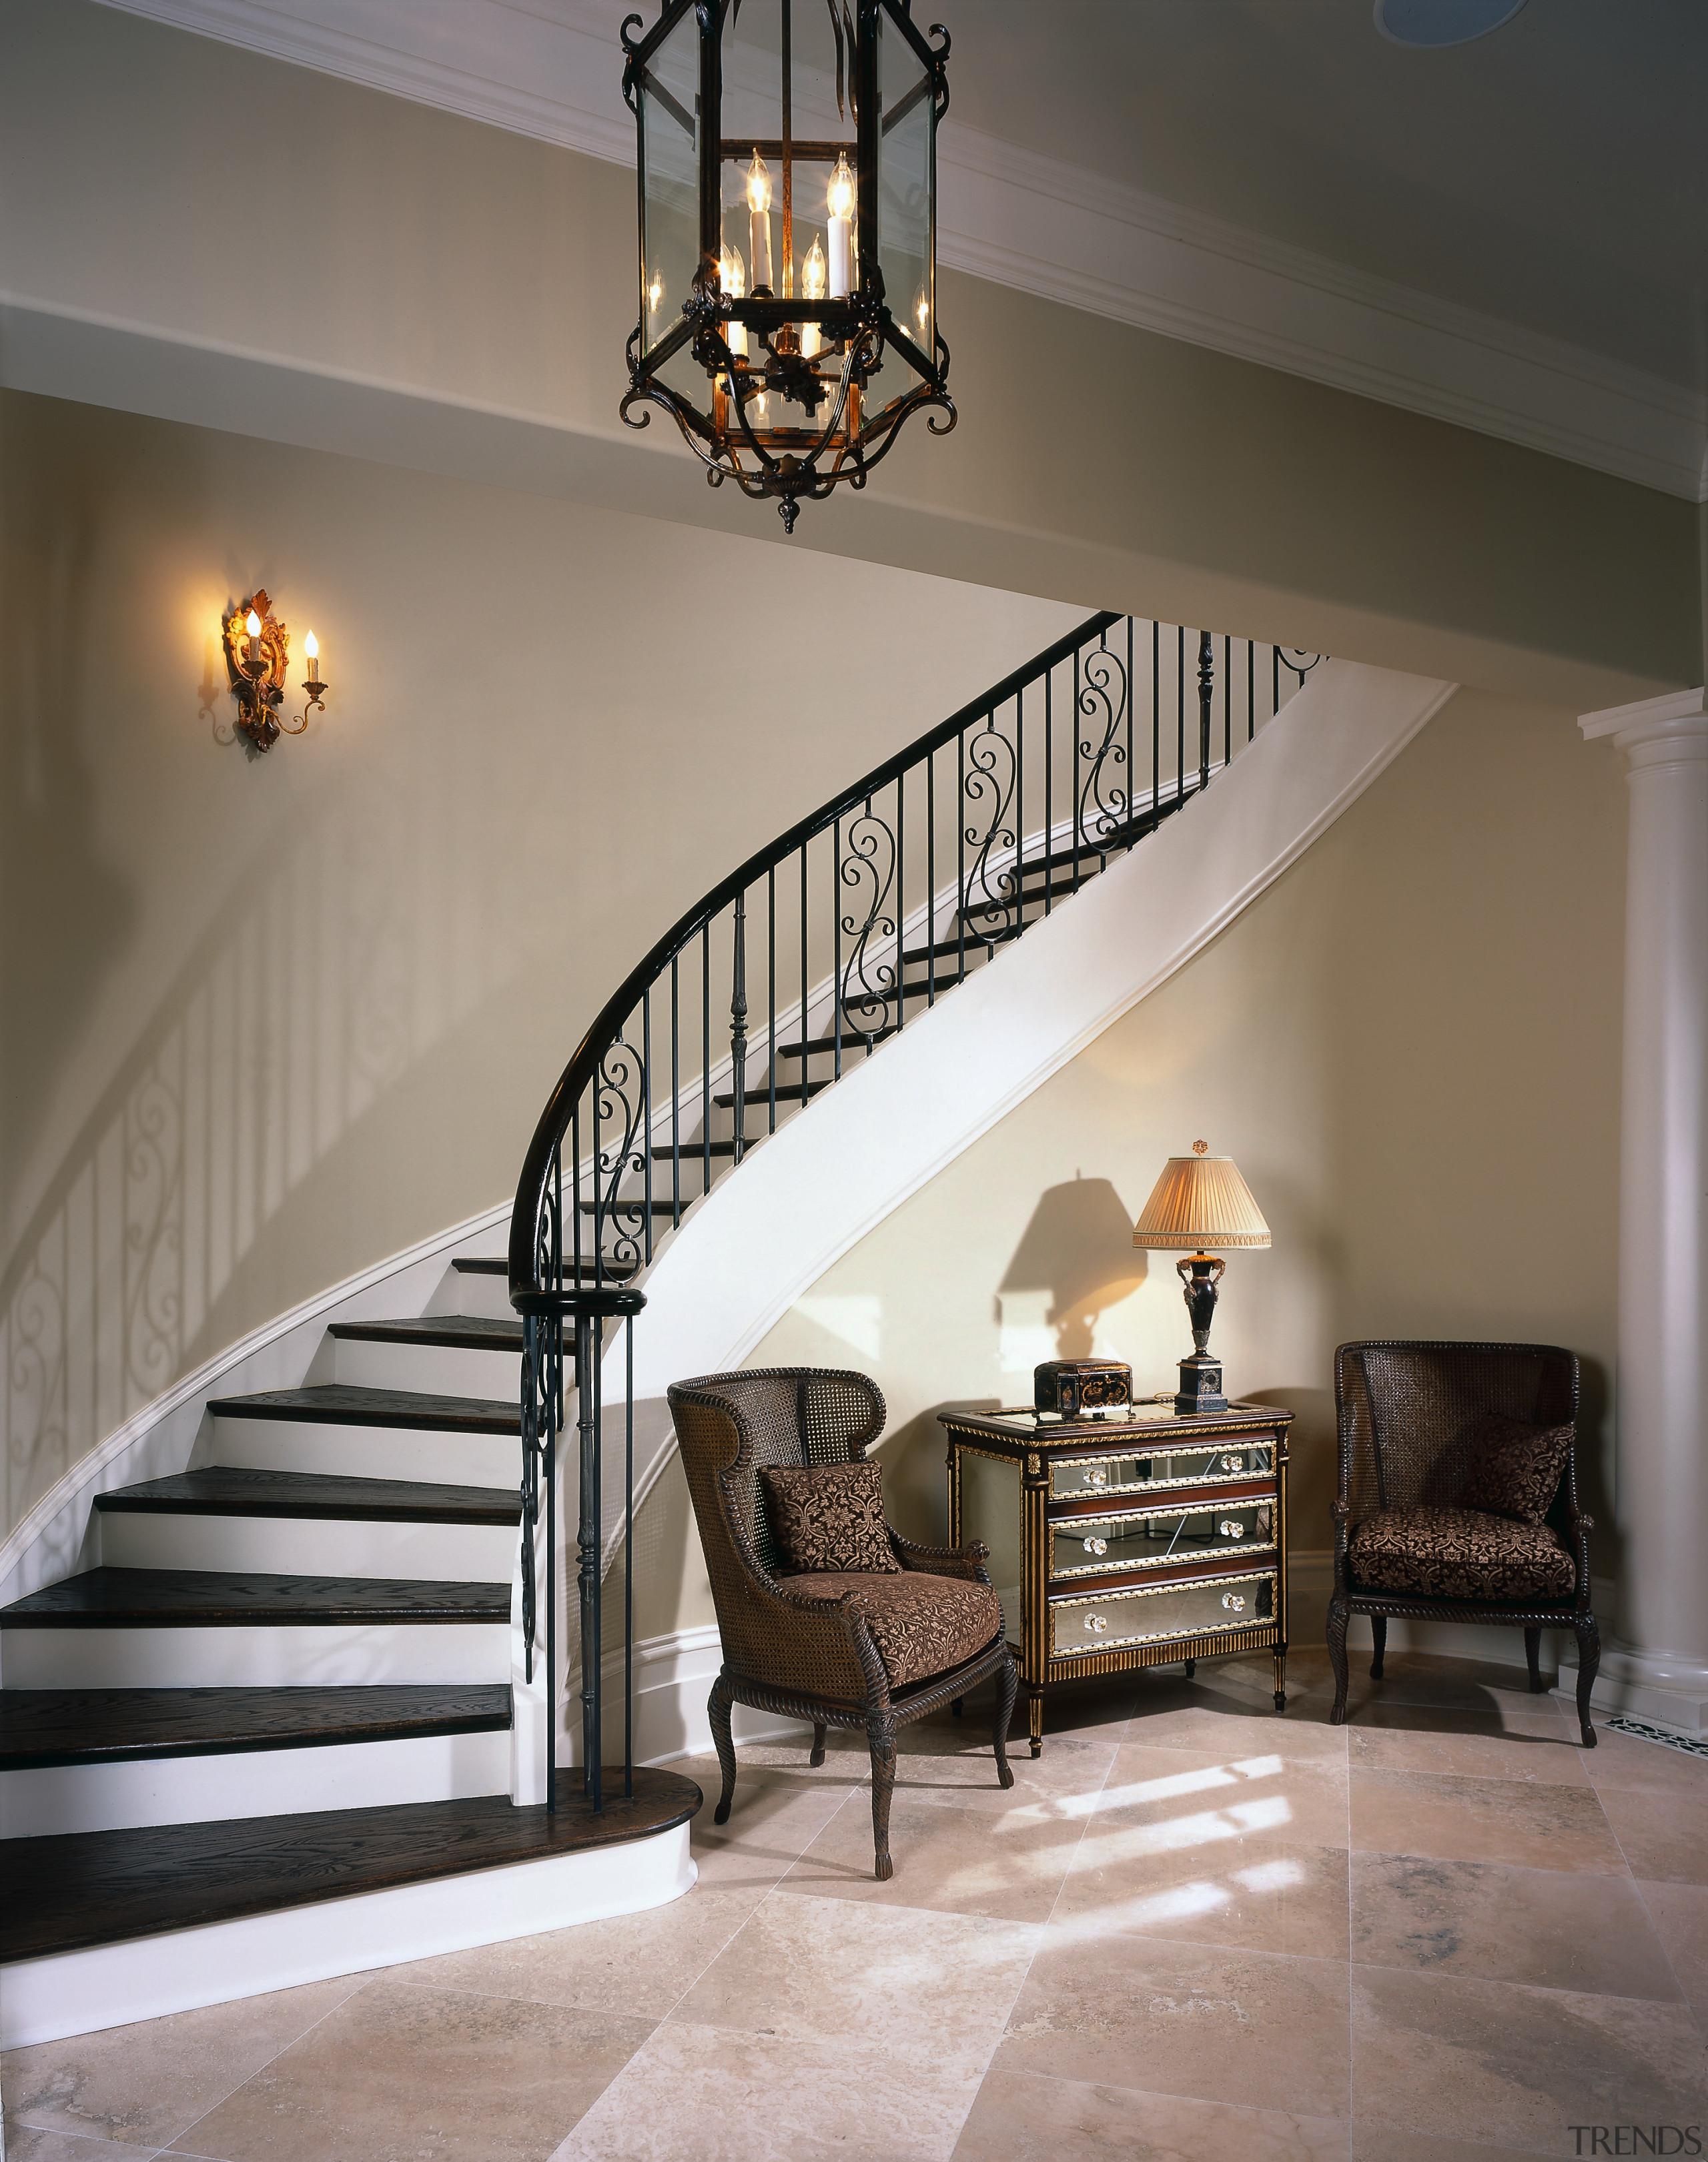 View of the stairway - View of the ceiling, estate, floor, flooring, handrail, hardwood, home, interior design, light fixture, lighting, stairs, wall, wood, wood flooring, gray